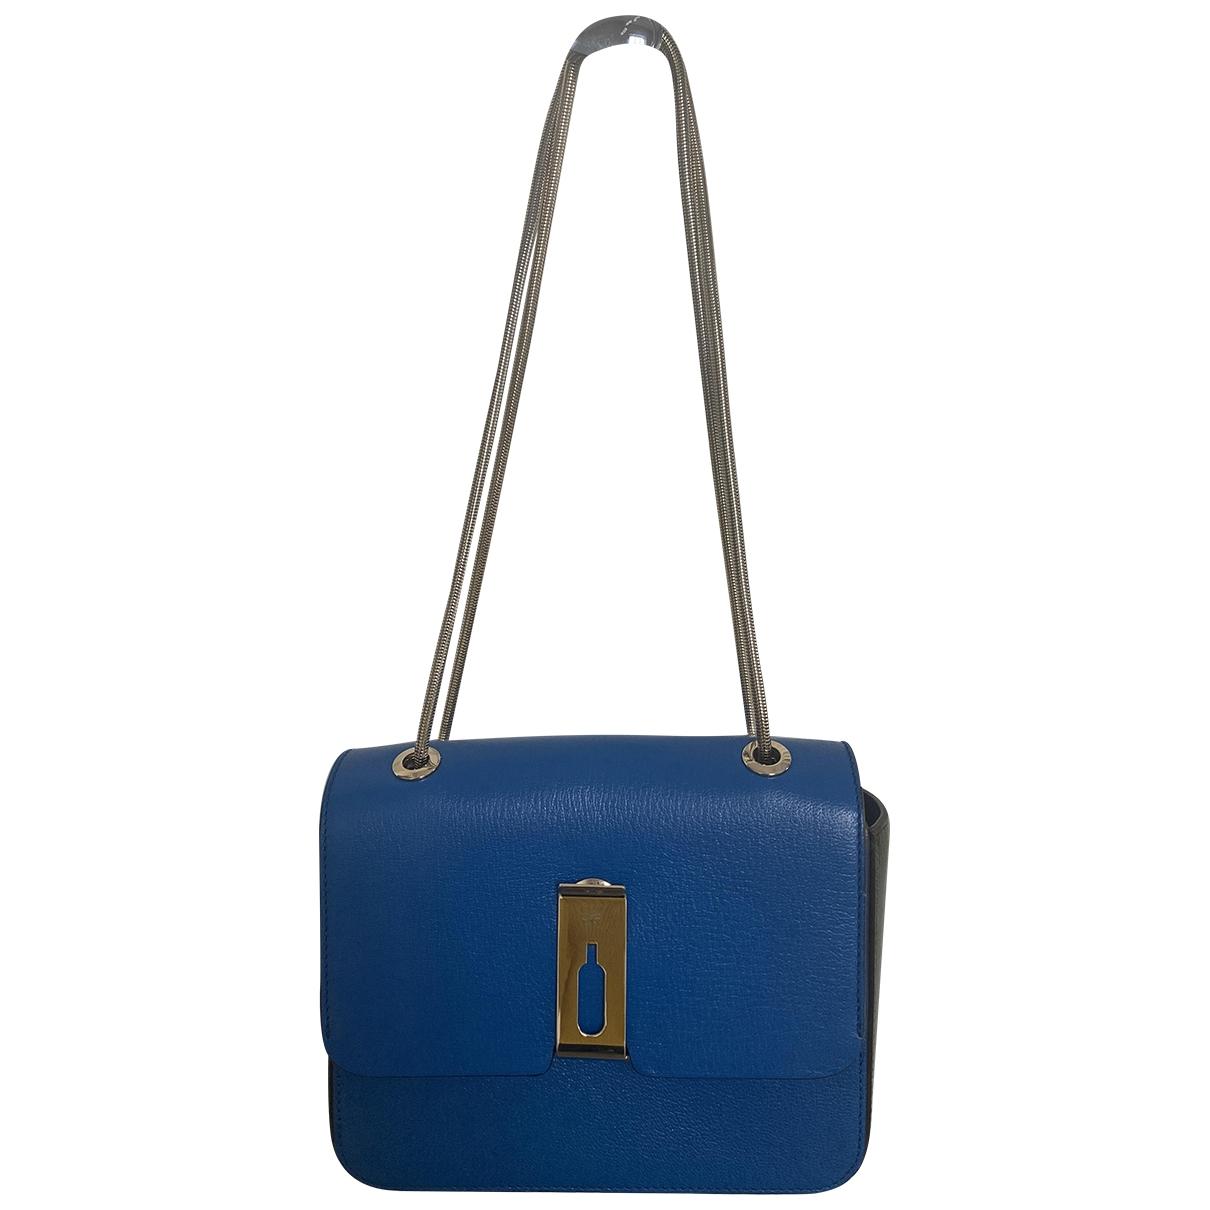 Anya Hindmarch \N Blue Leather handbag for Women \N